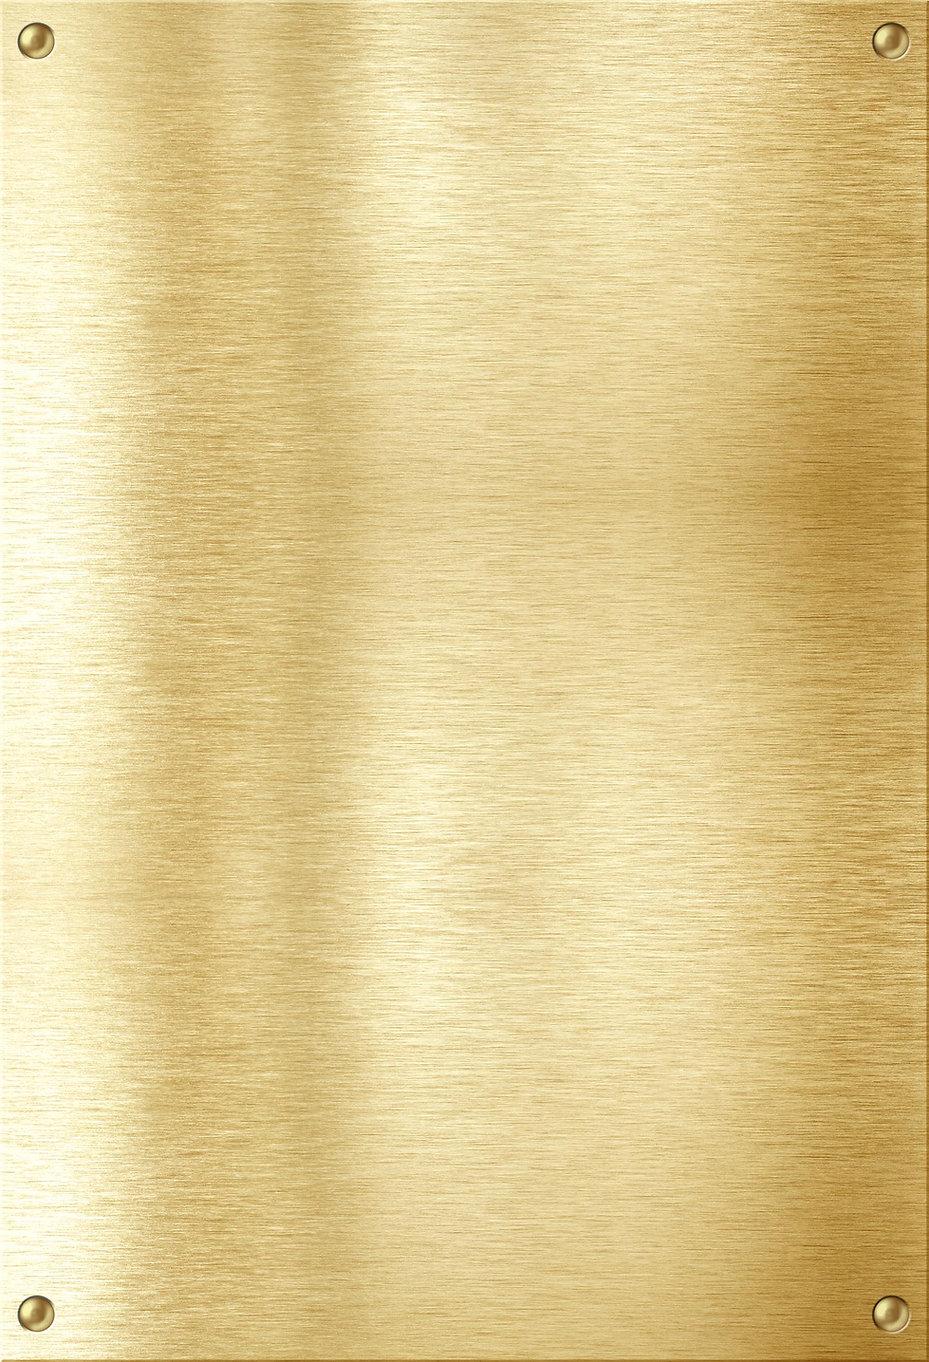 Award Gold Long.jpg